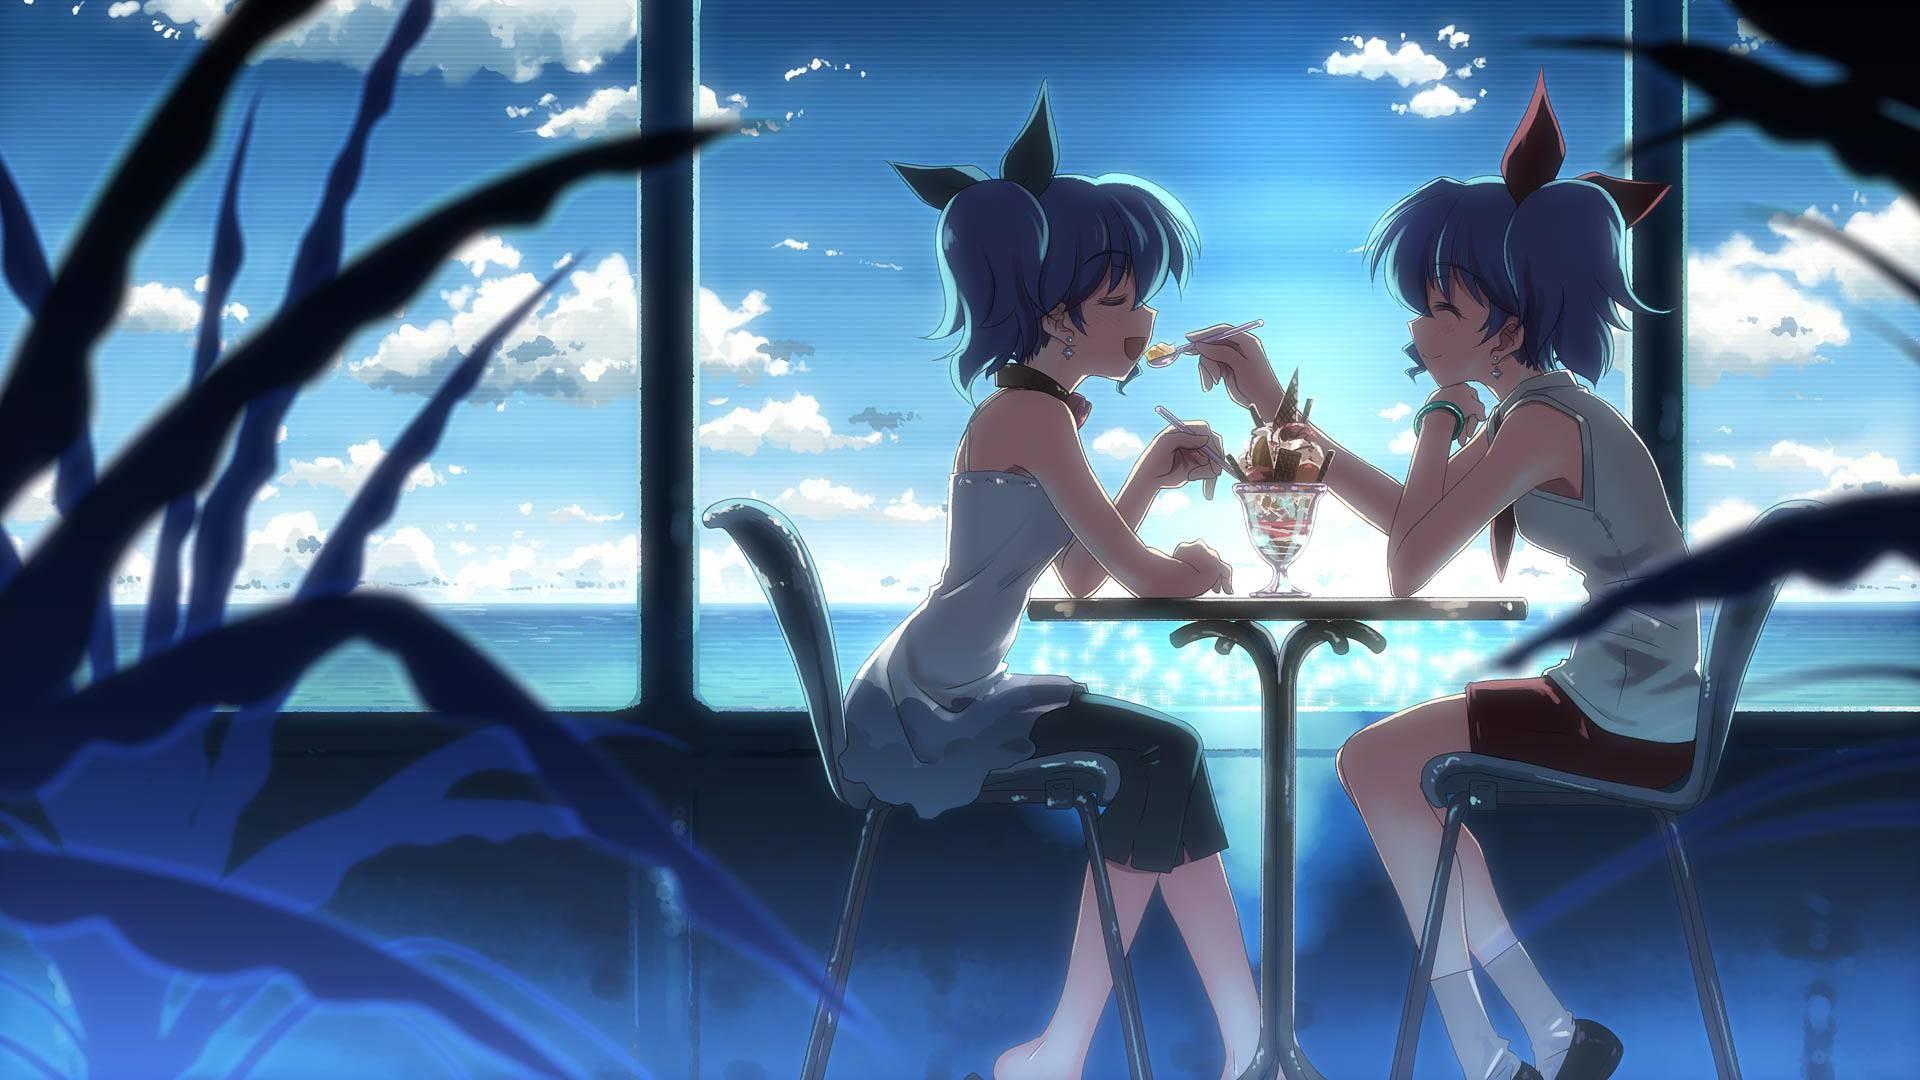 Romantic anime twins – Anime & Manga Wallpaper